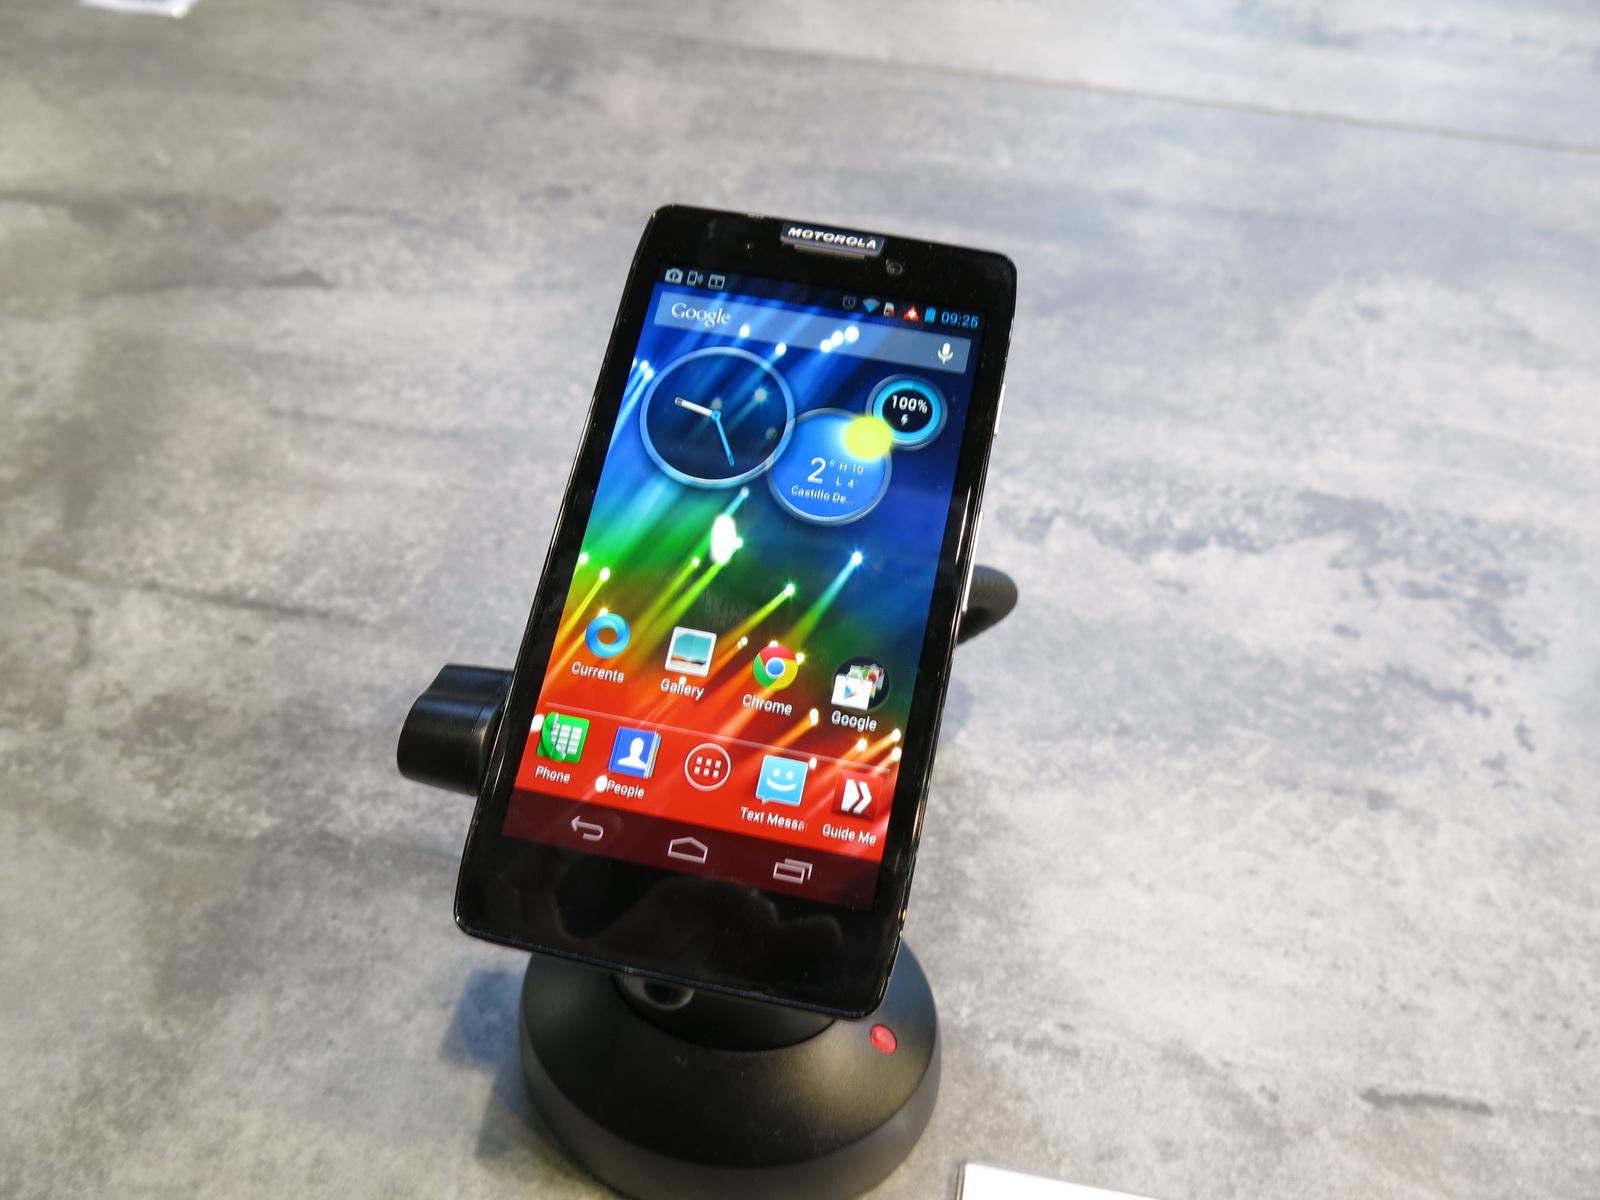 MWC 2013: Motorola RAZR HD Hands on in Barcelona, Ghost of ...